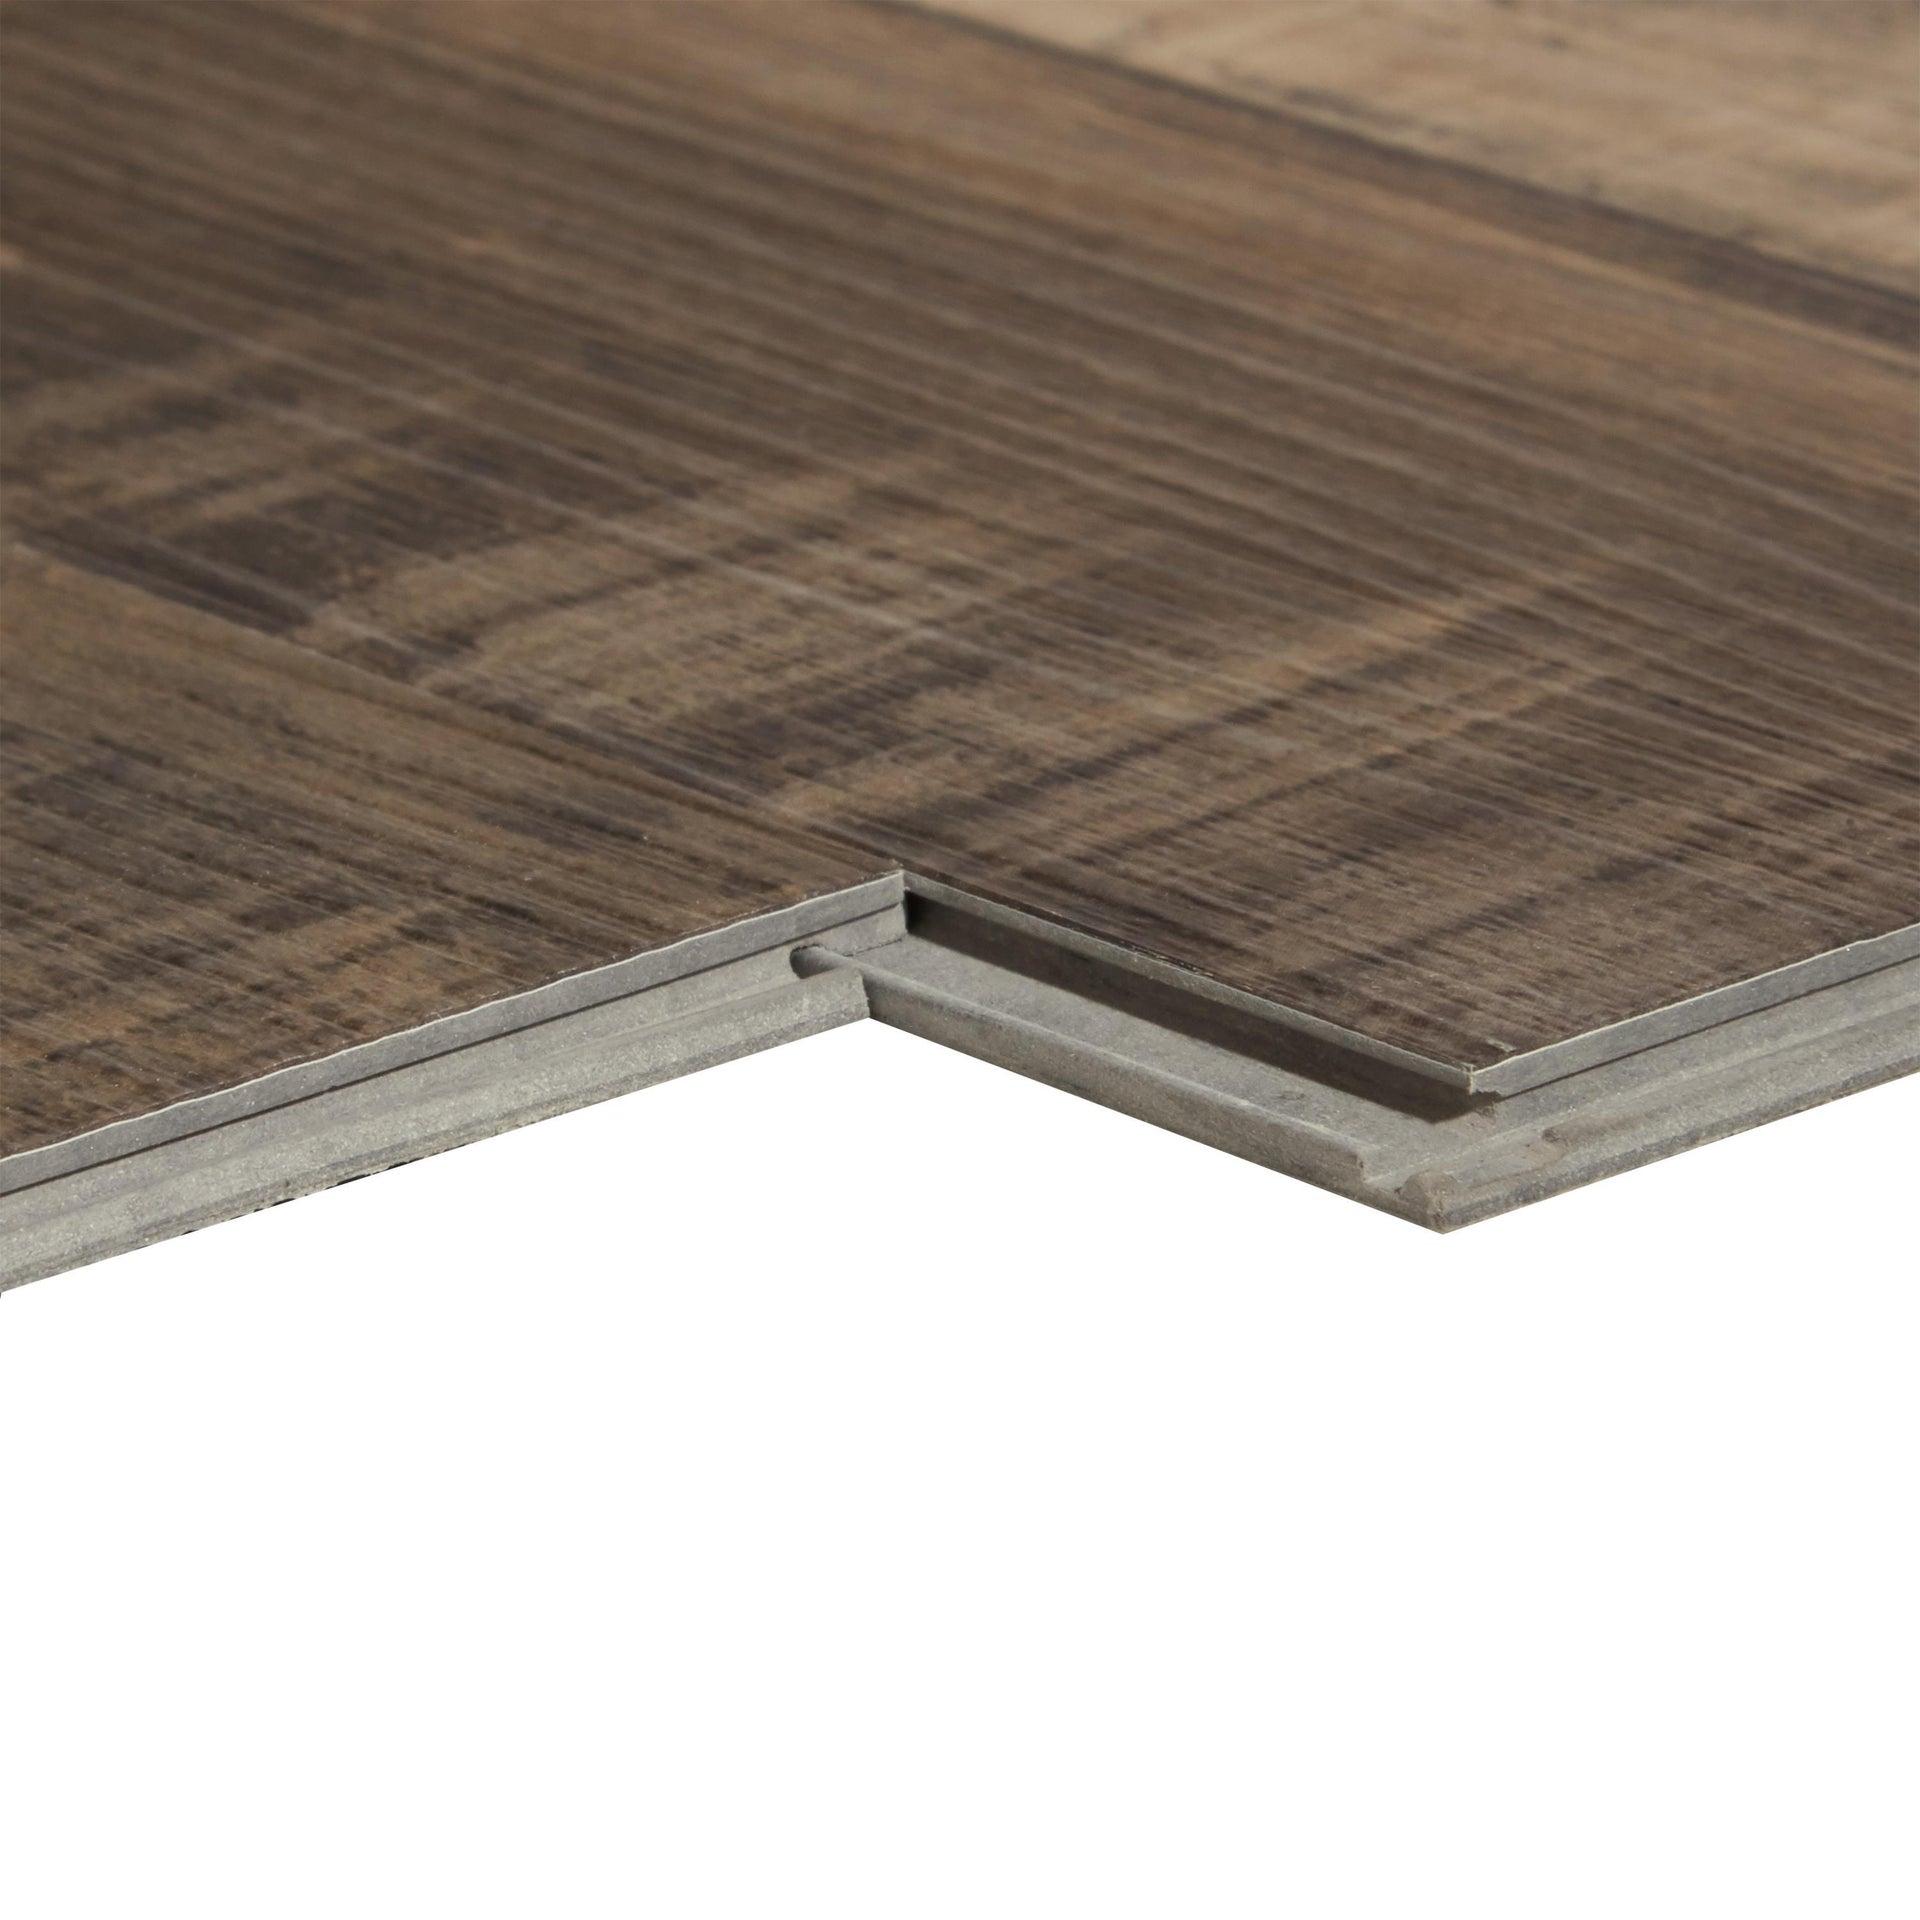 Pavimento PVC flottante clic+ Tantalu Sp 4.2 mm multicolore - 3